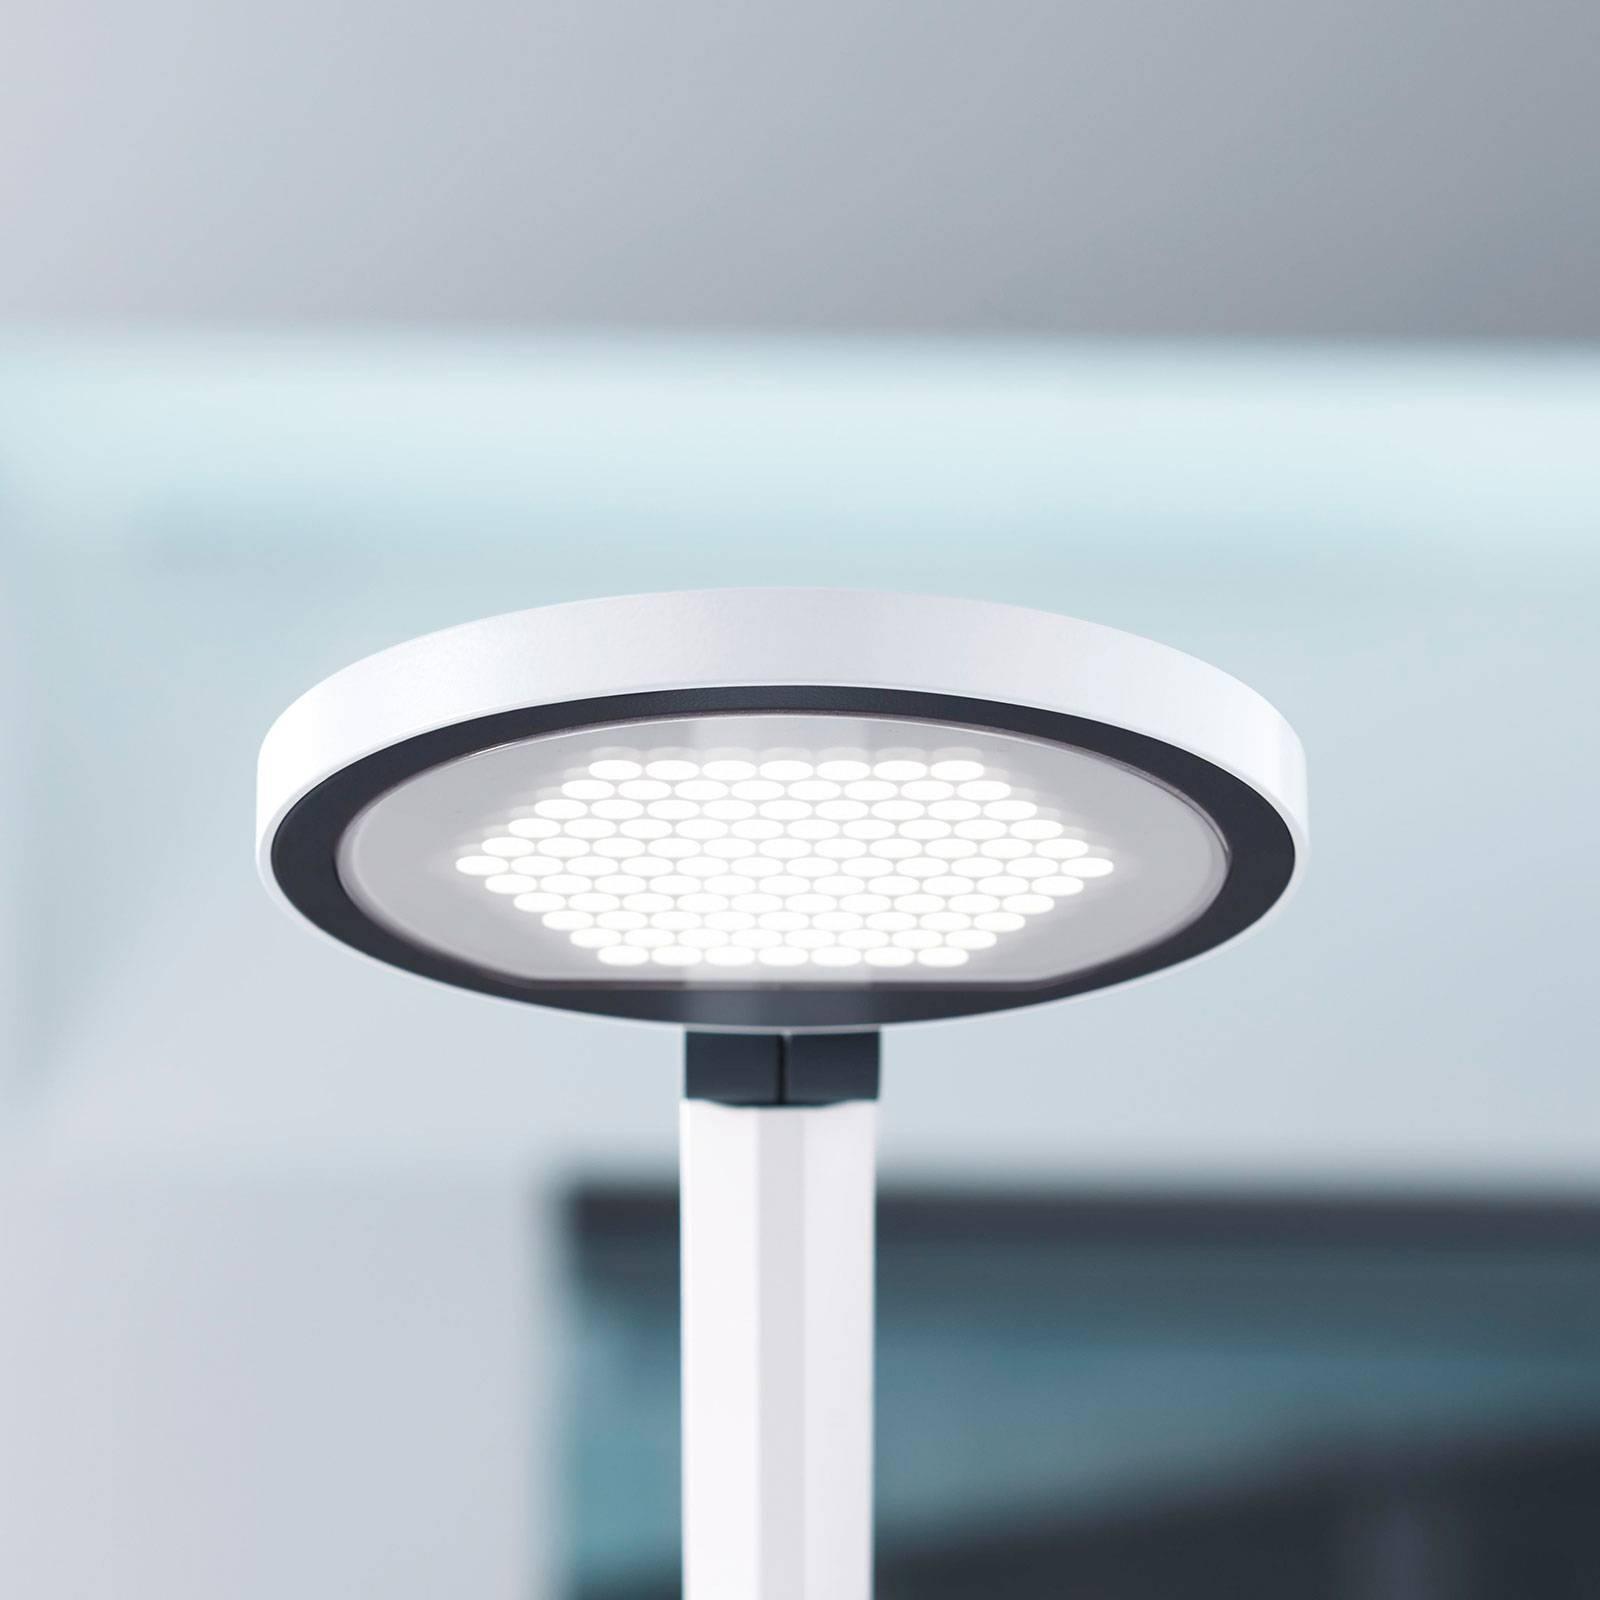 Lampe à poser LED PARA.MI FTL 102 R blanc 940